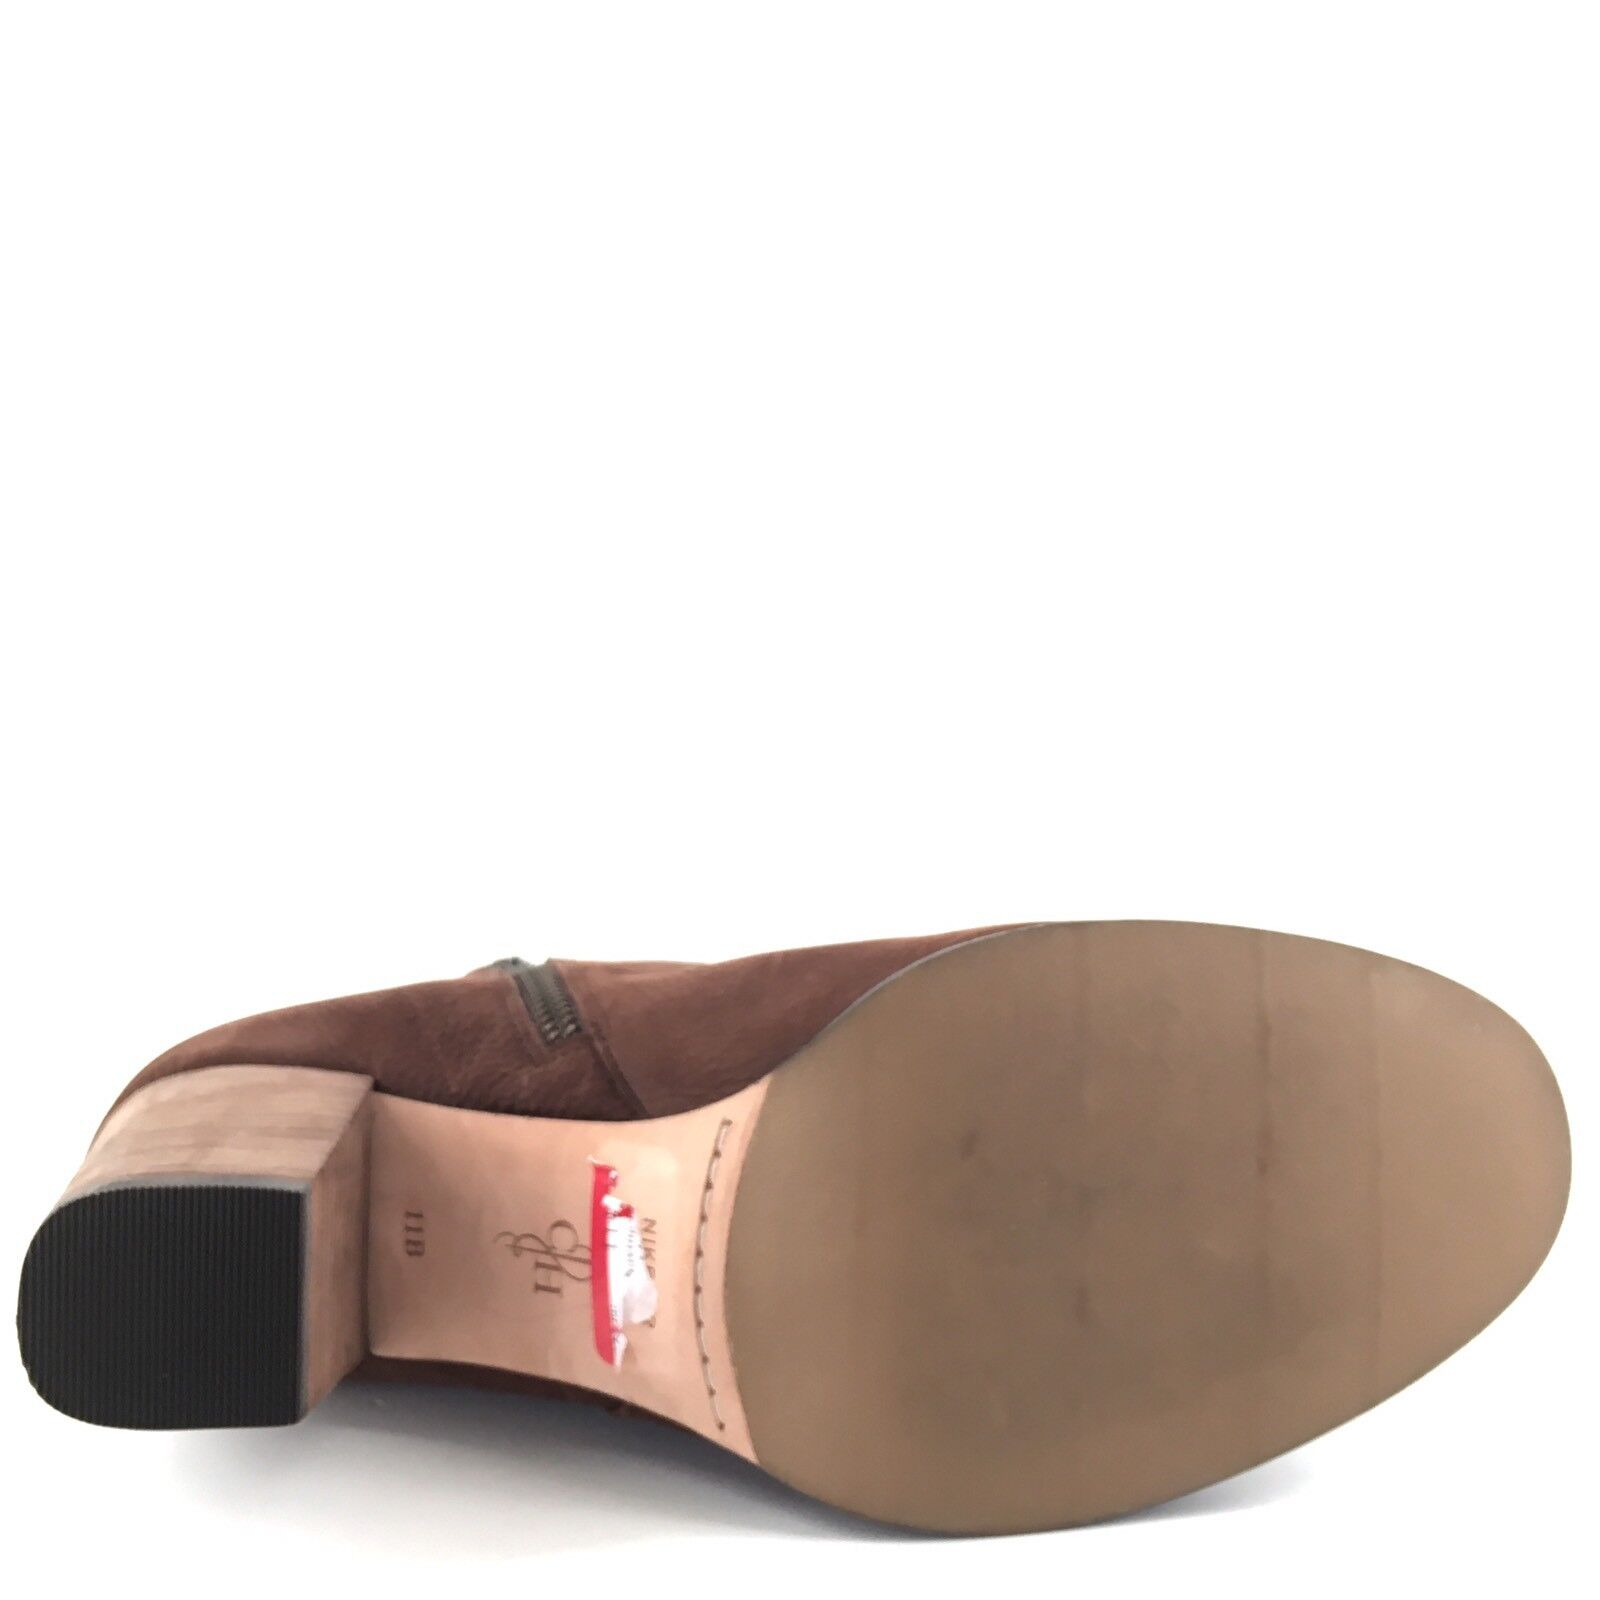 New Cole Leder Haan Cassidy ROTwood Braun Leder Cole Ankle Stiefel Damenschuhe Größe 11 M 278 0a0f41